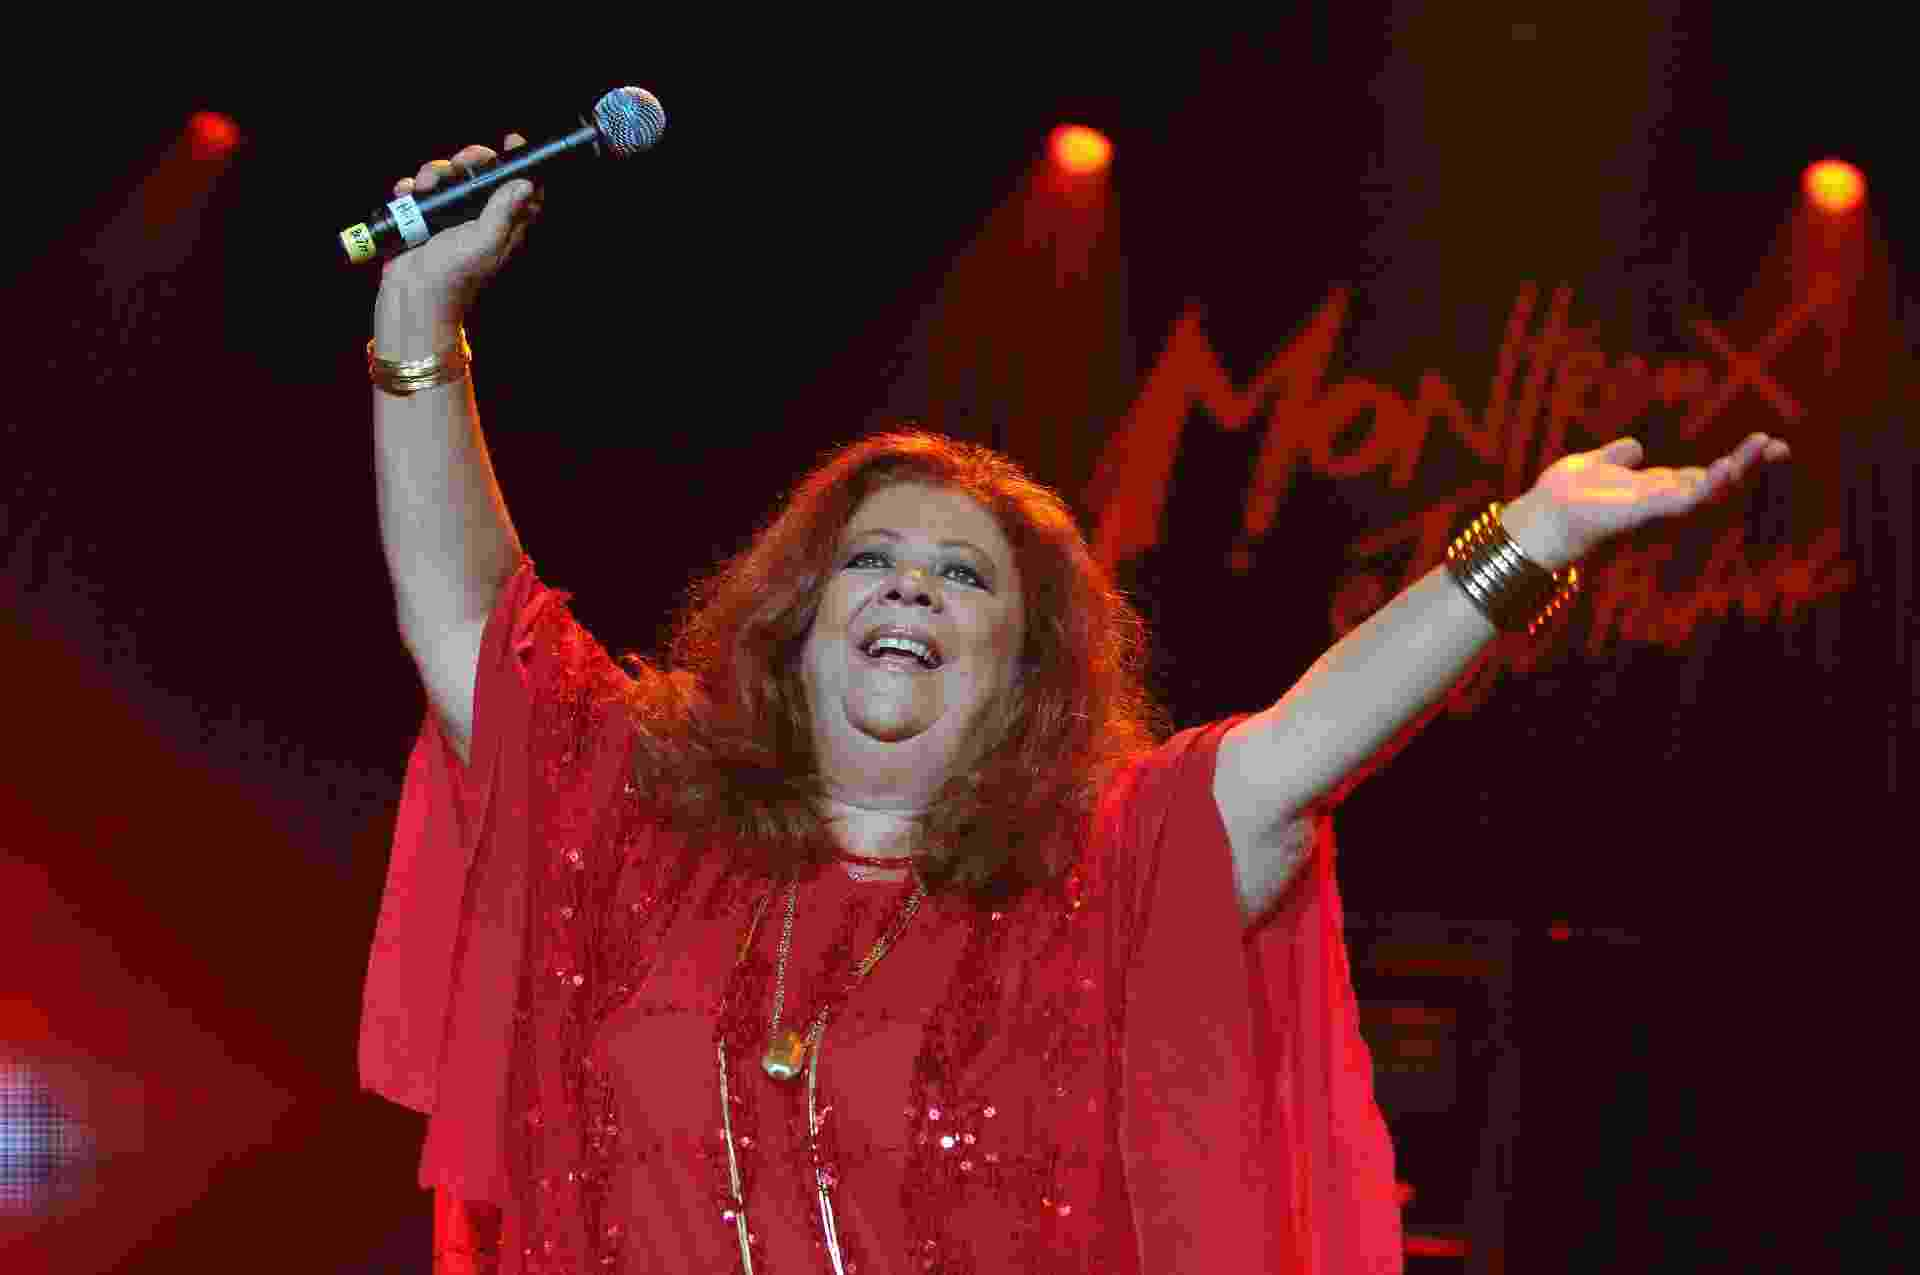 Beth Carvalho se apresentou no Montreux Jazz Festival, na Suíça, em julho de 2007 - Lionel FLUSIN/Gamma-Rapho via Getty Images